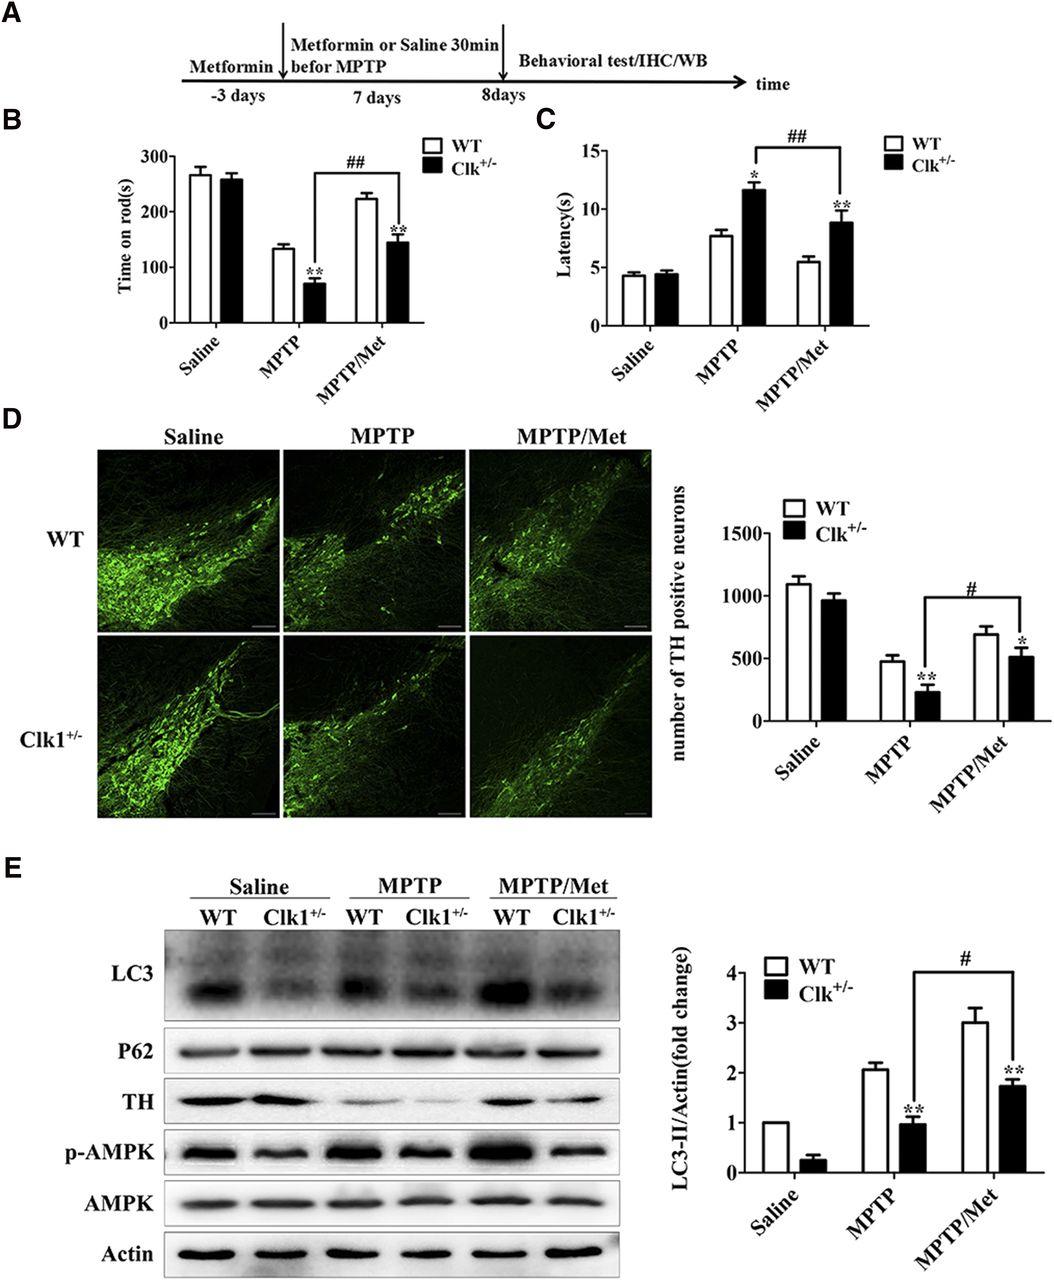 Activation of AMPKmTORC1Mediated Autophagy by Metformin